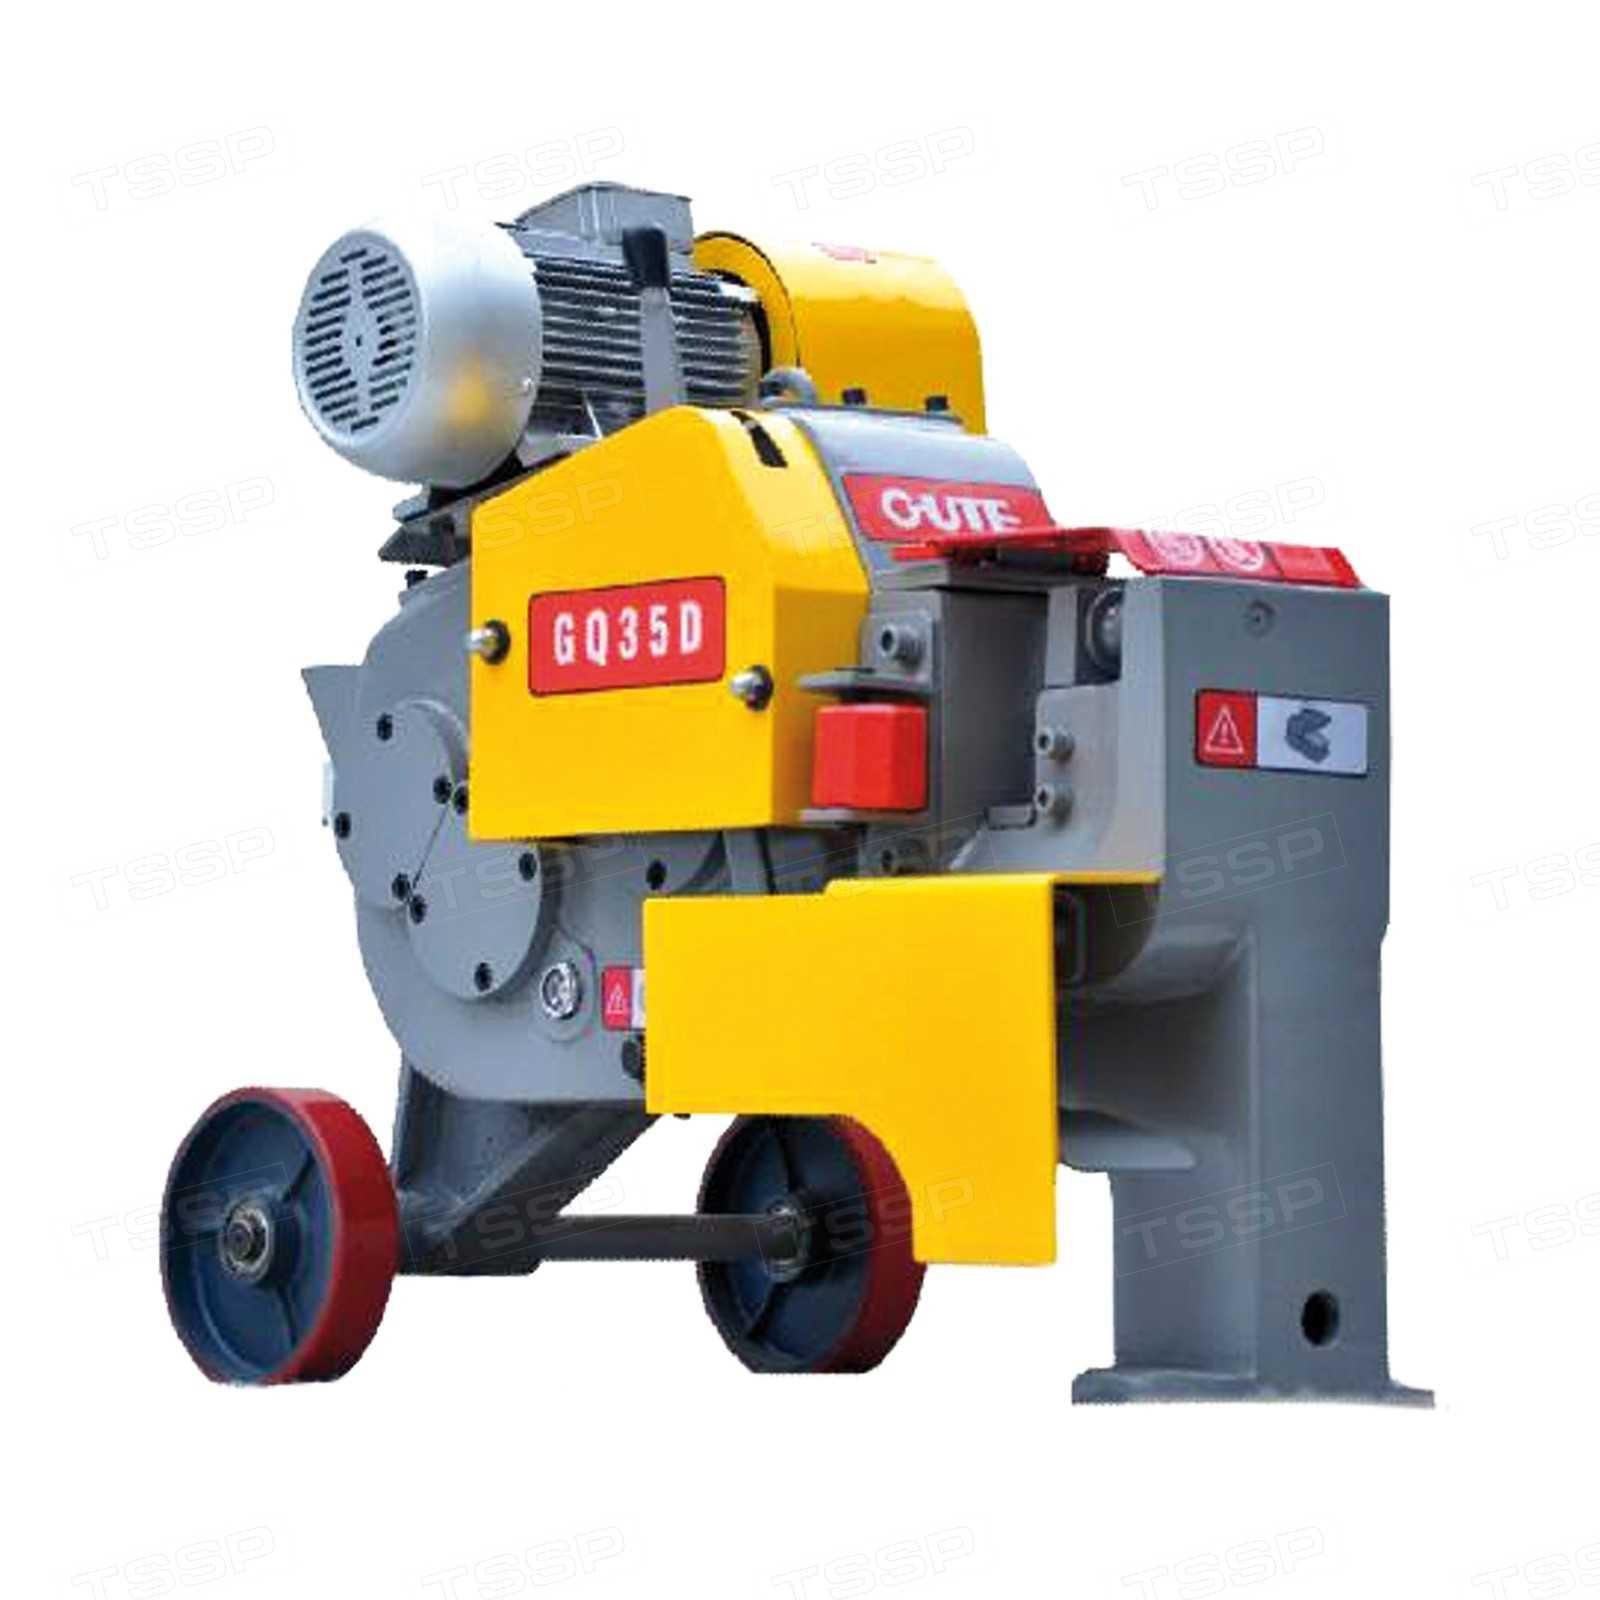 Продам б/у станок для вытяжки бухт диаметром до 10 мм (металл)